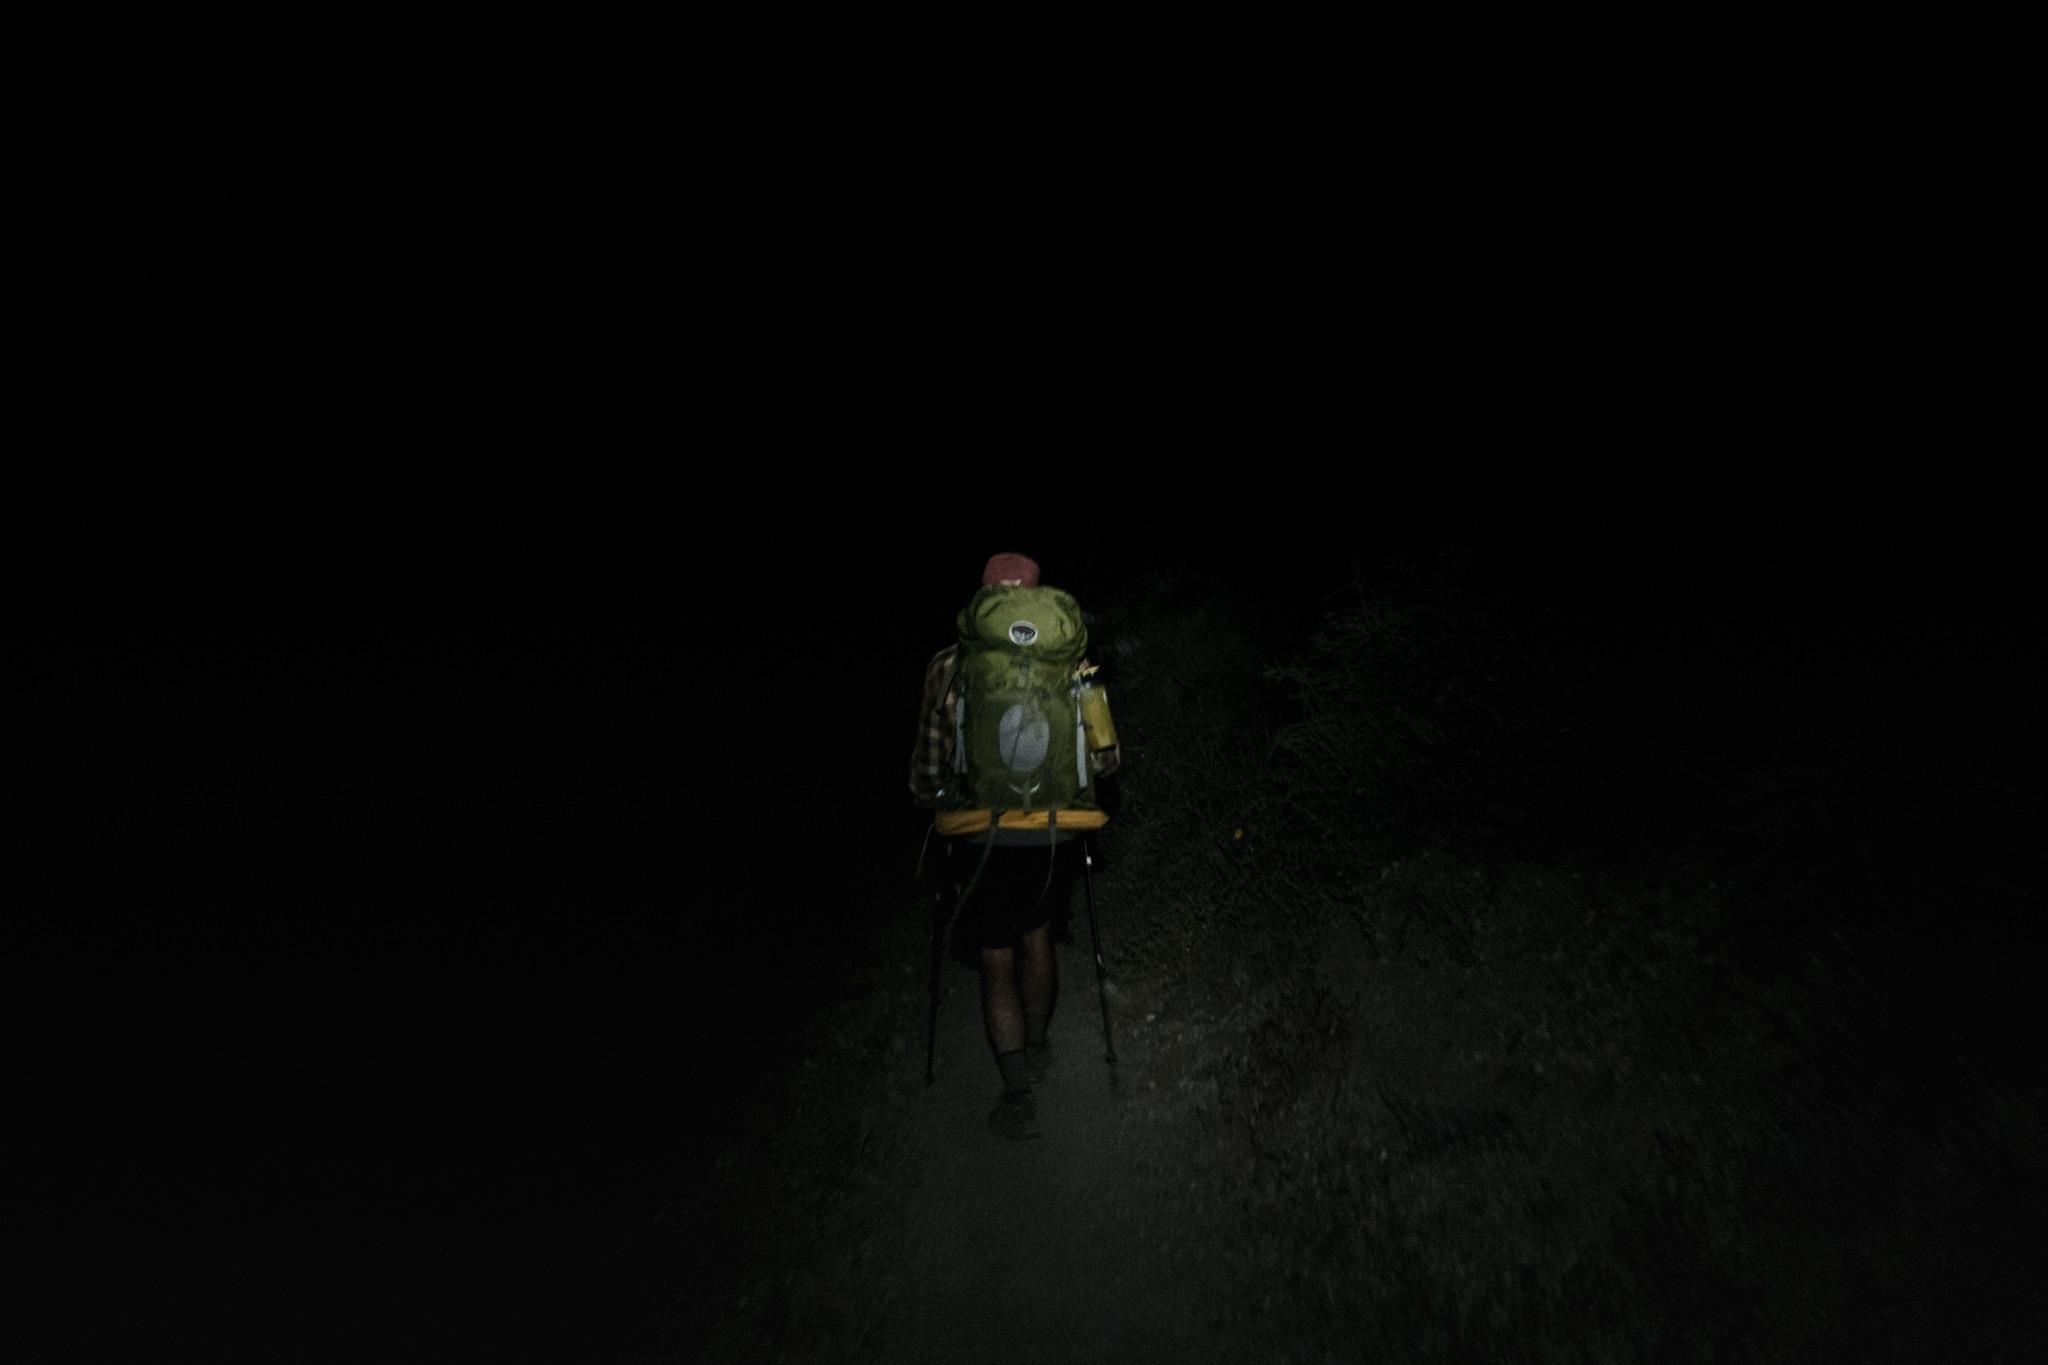 Night hiking.